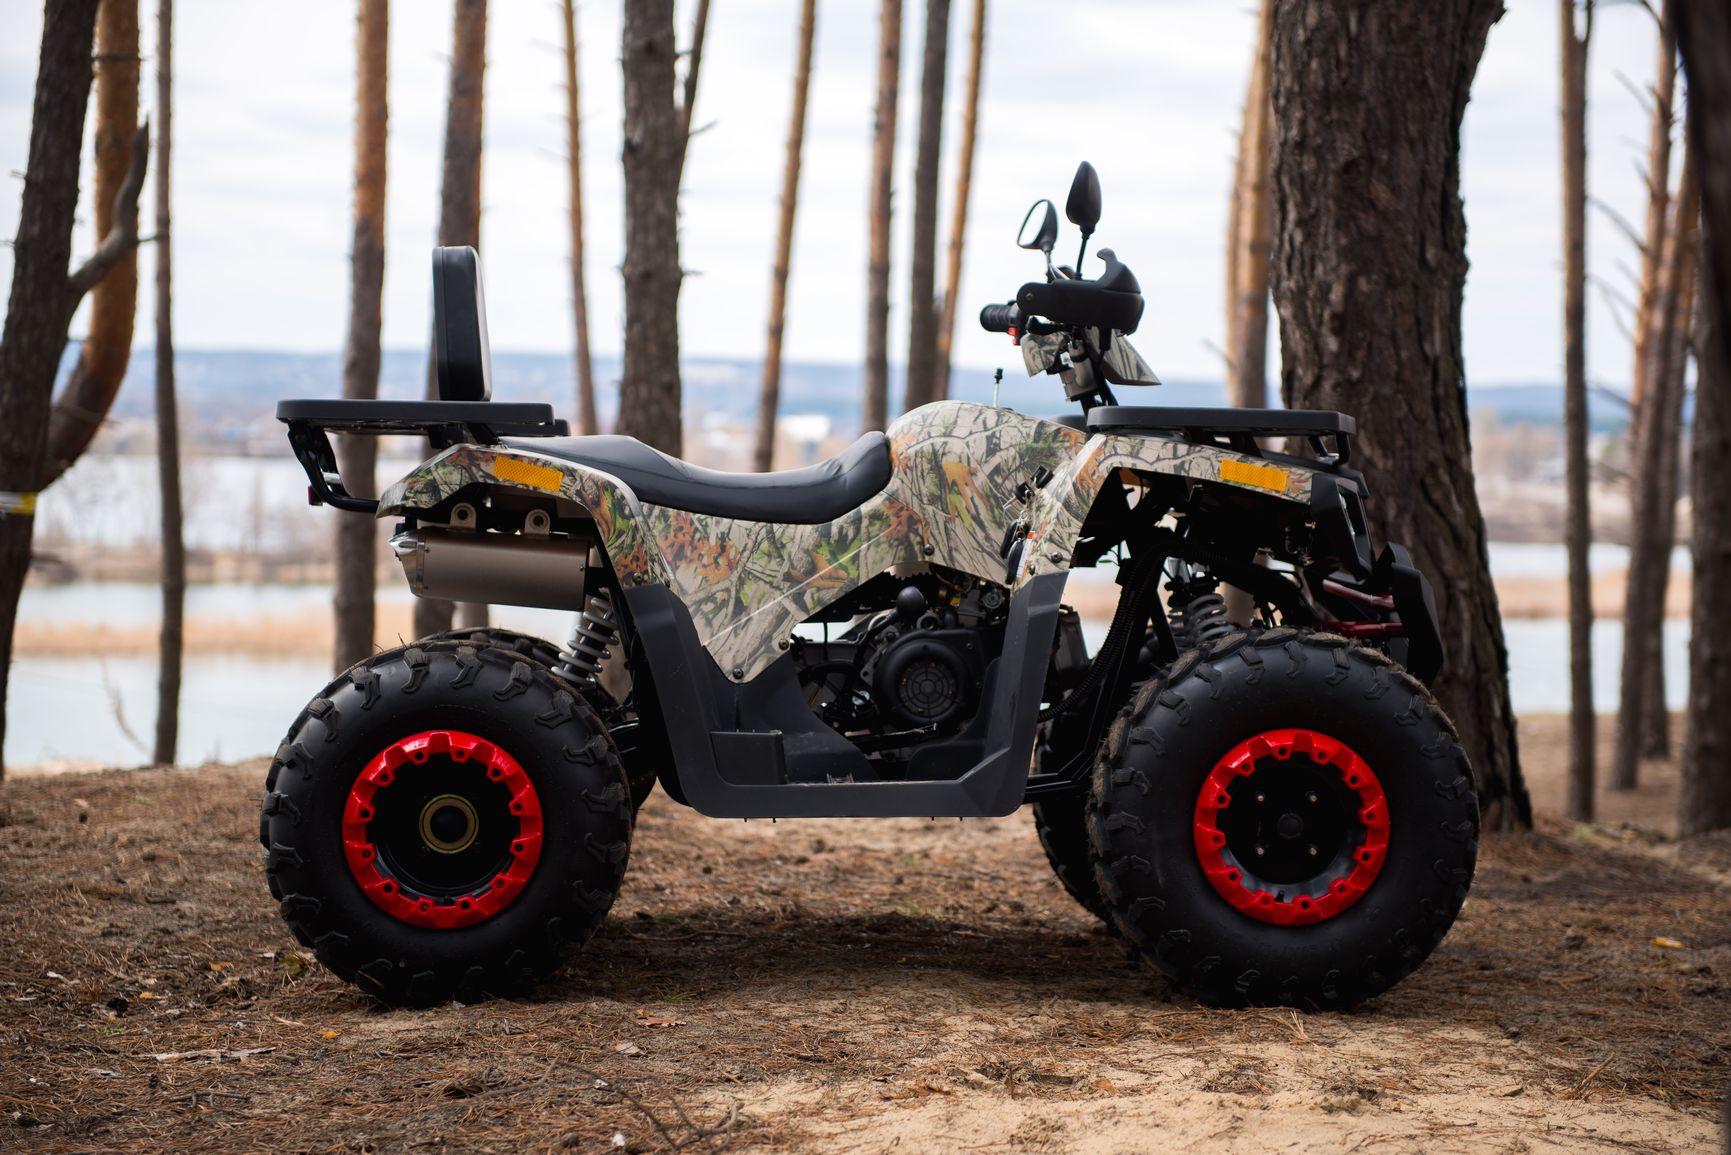 КВАДРОЦИКЛ COMMAN SCORPION 200 ― Артмото - купить квадроцикл в украине и харькове, мотоцикл, снегоход, скутер, мопед, электромобиль